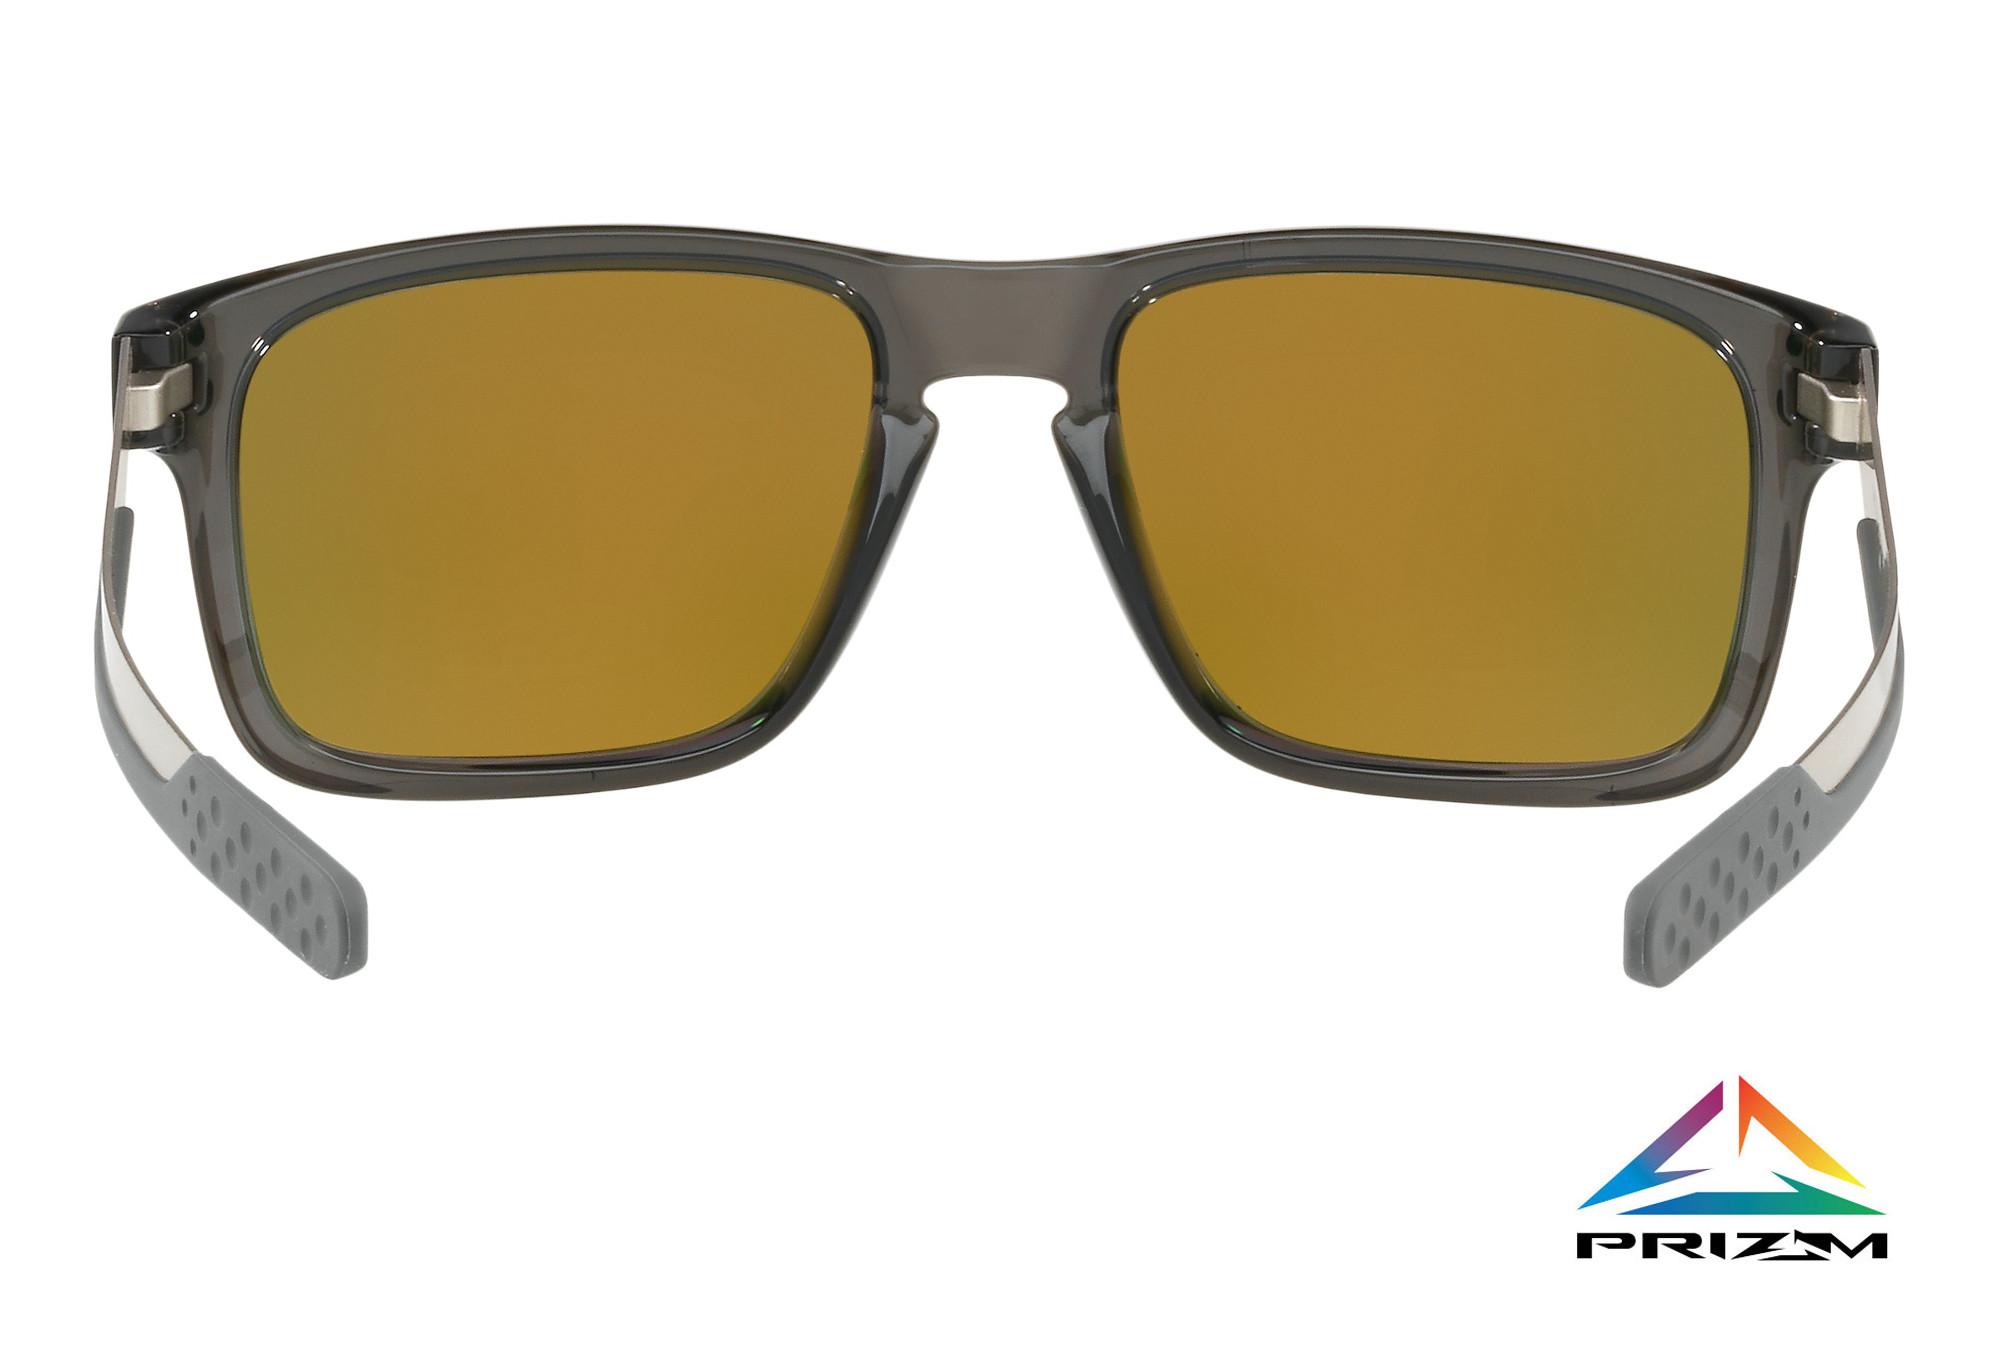 e28e4ce87b7 OAKLEY Sunglasses Holbrook Mix Grey Smoke Prizm Ruby Polarized Ref  OO9384 -0757